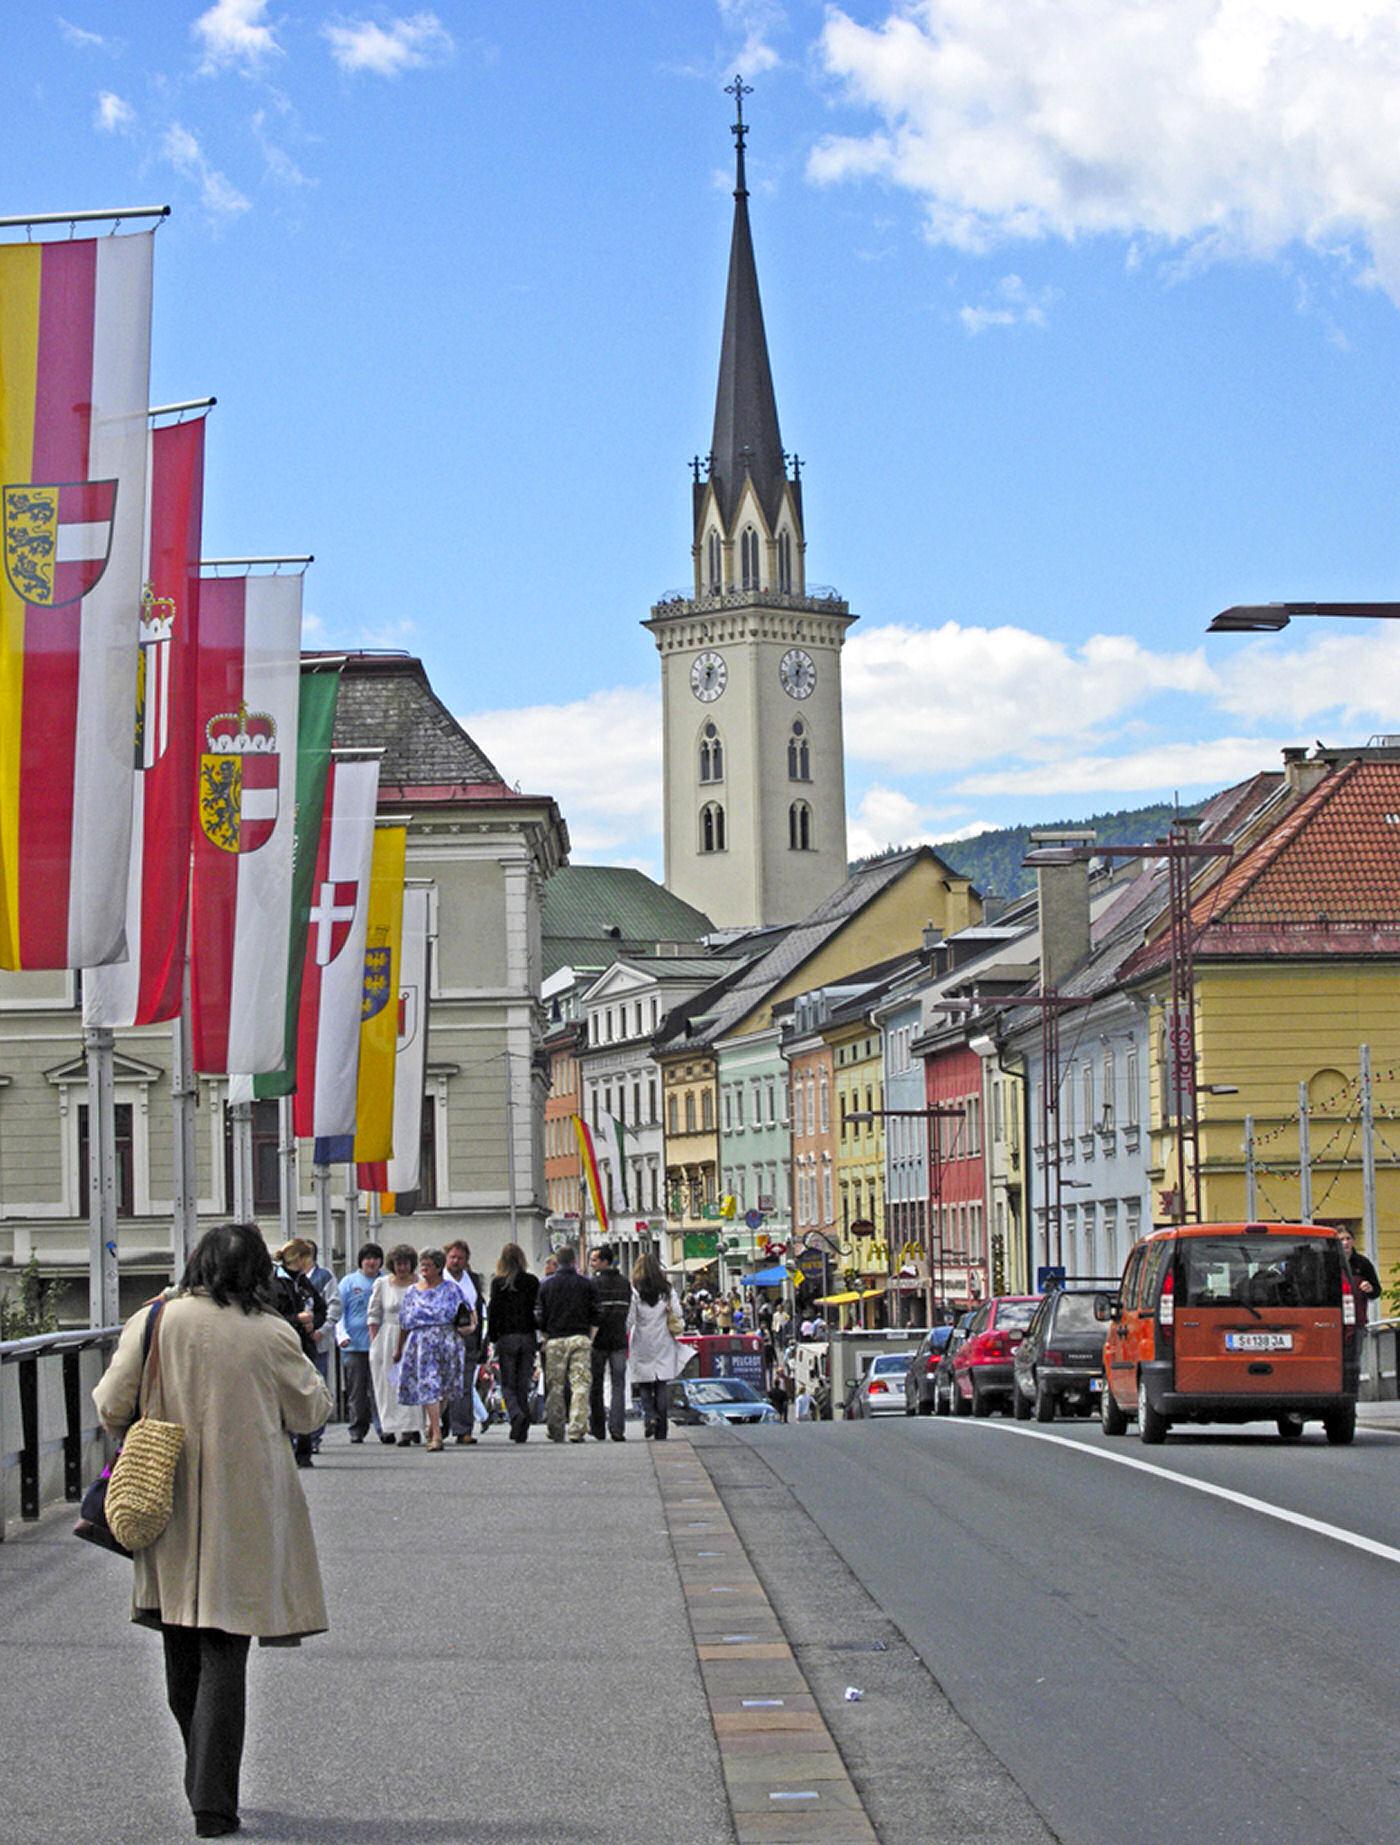 Villach old town called Altstadt, Carinthia, Austria